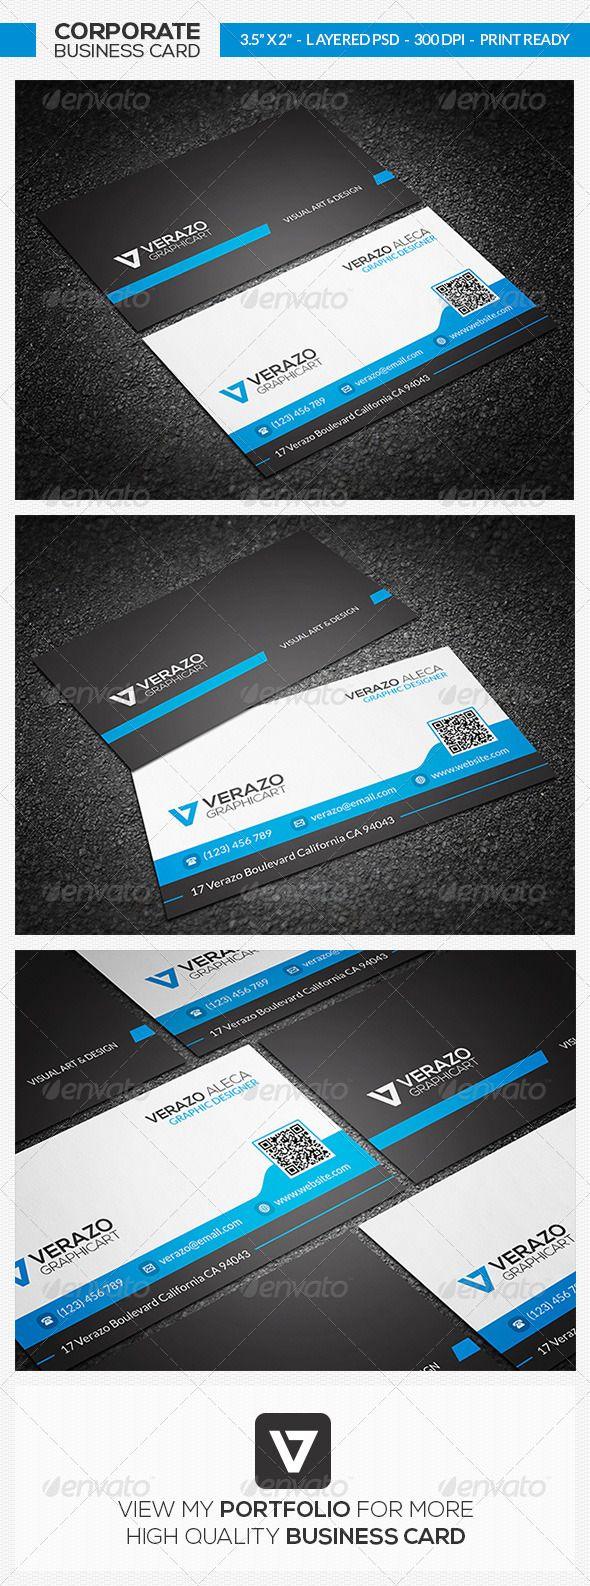 13 best business card ideas images on pinterest business card clean business card 30 colourmoves